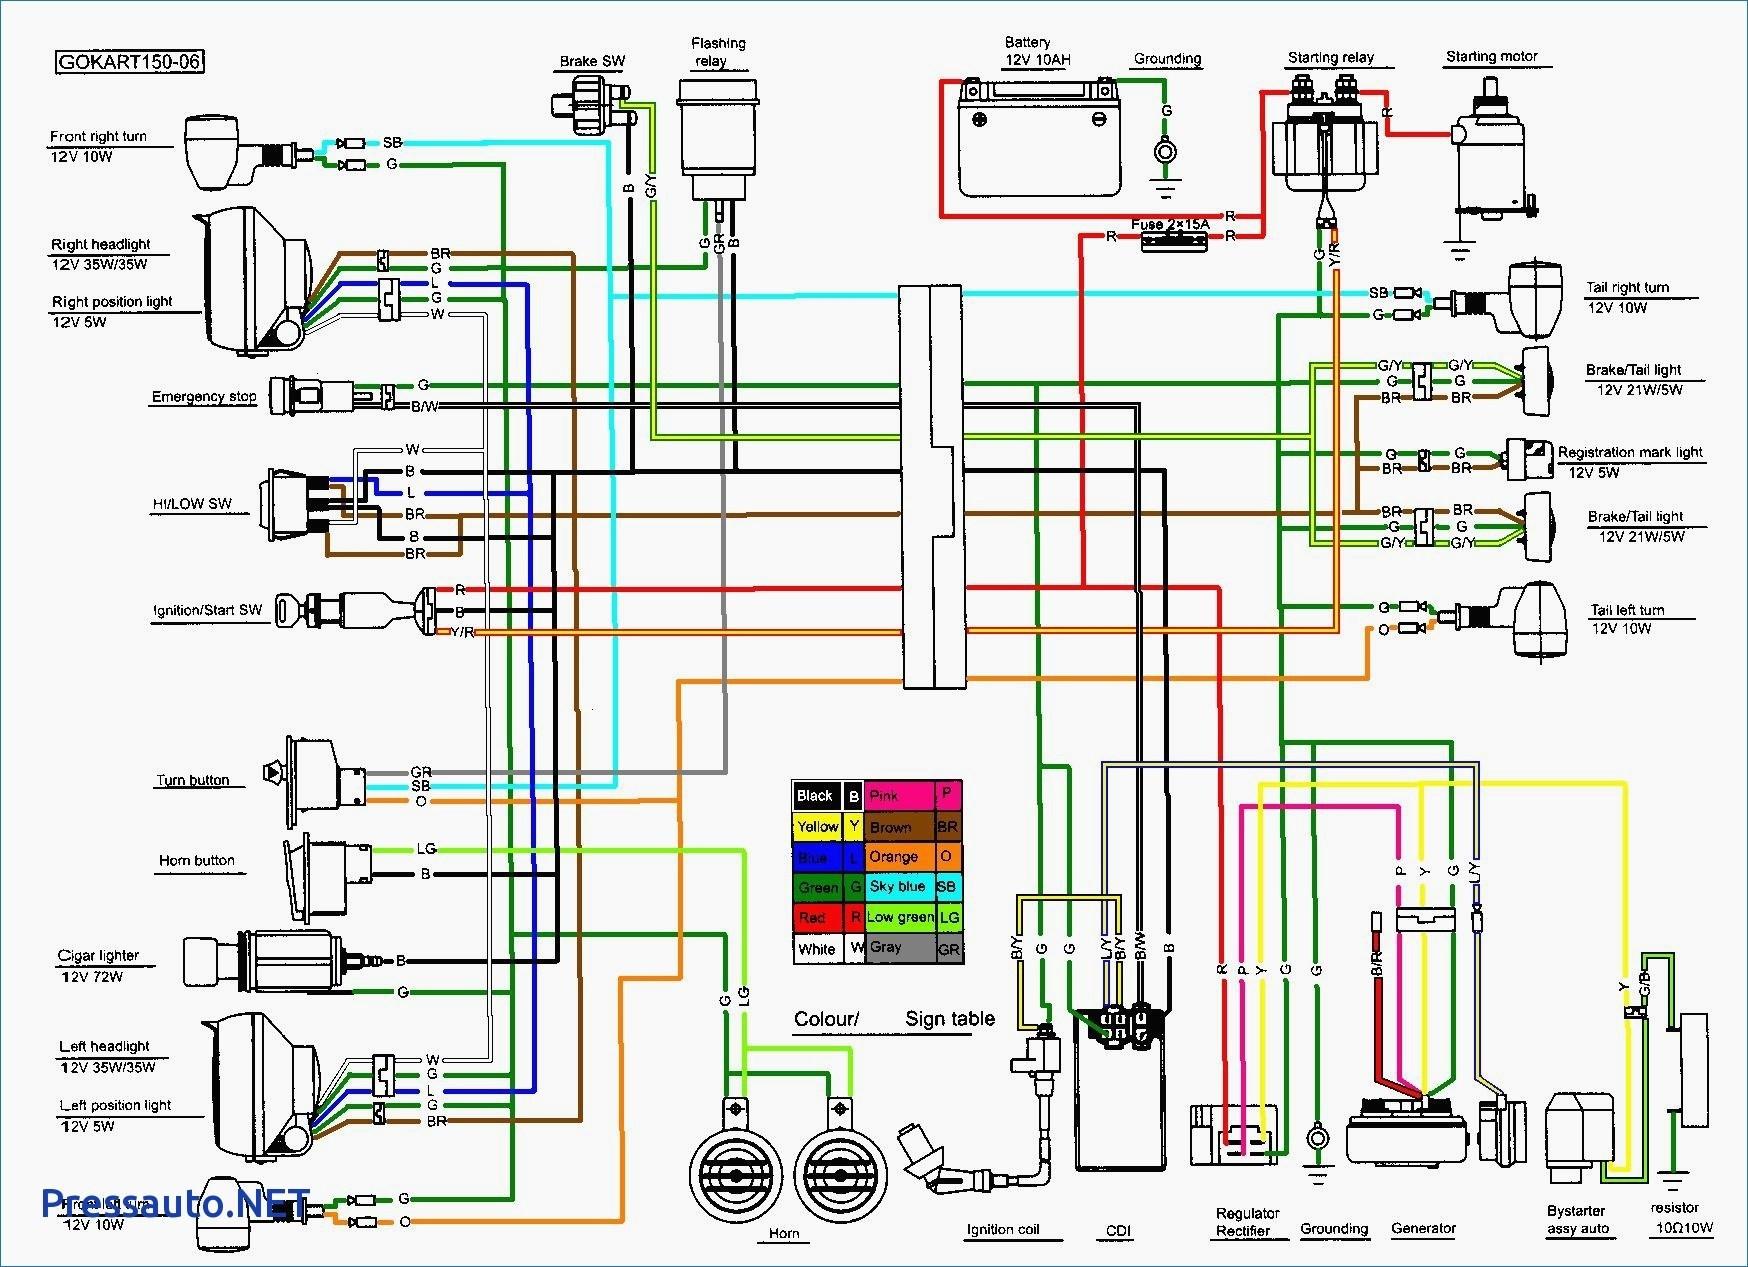 Taotao 110cc atv Wiring Diagram | Free Wiring Diagram